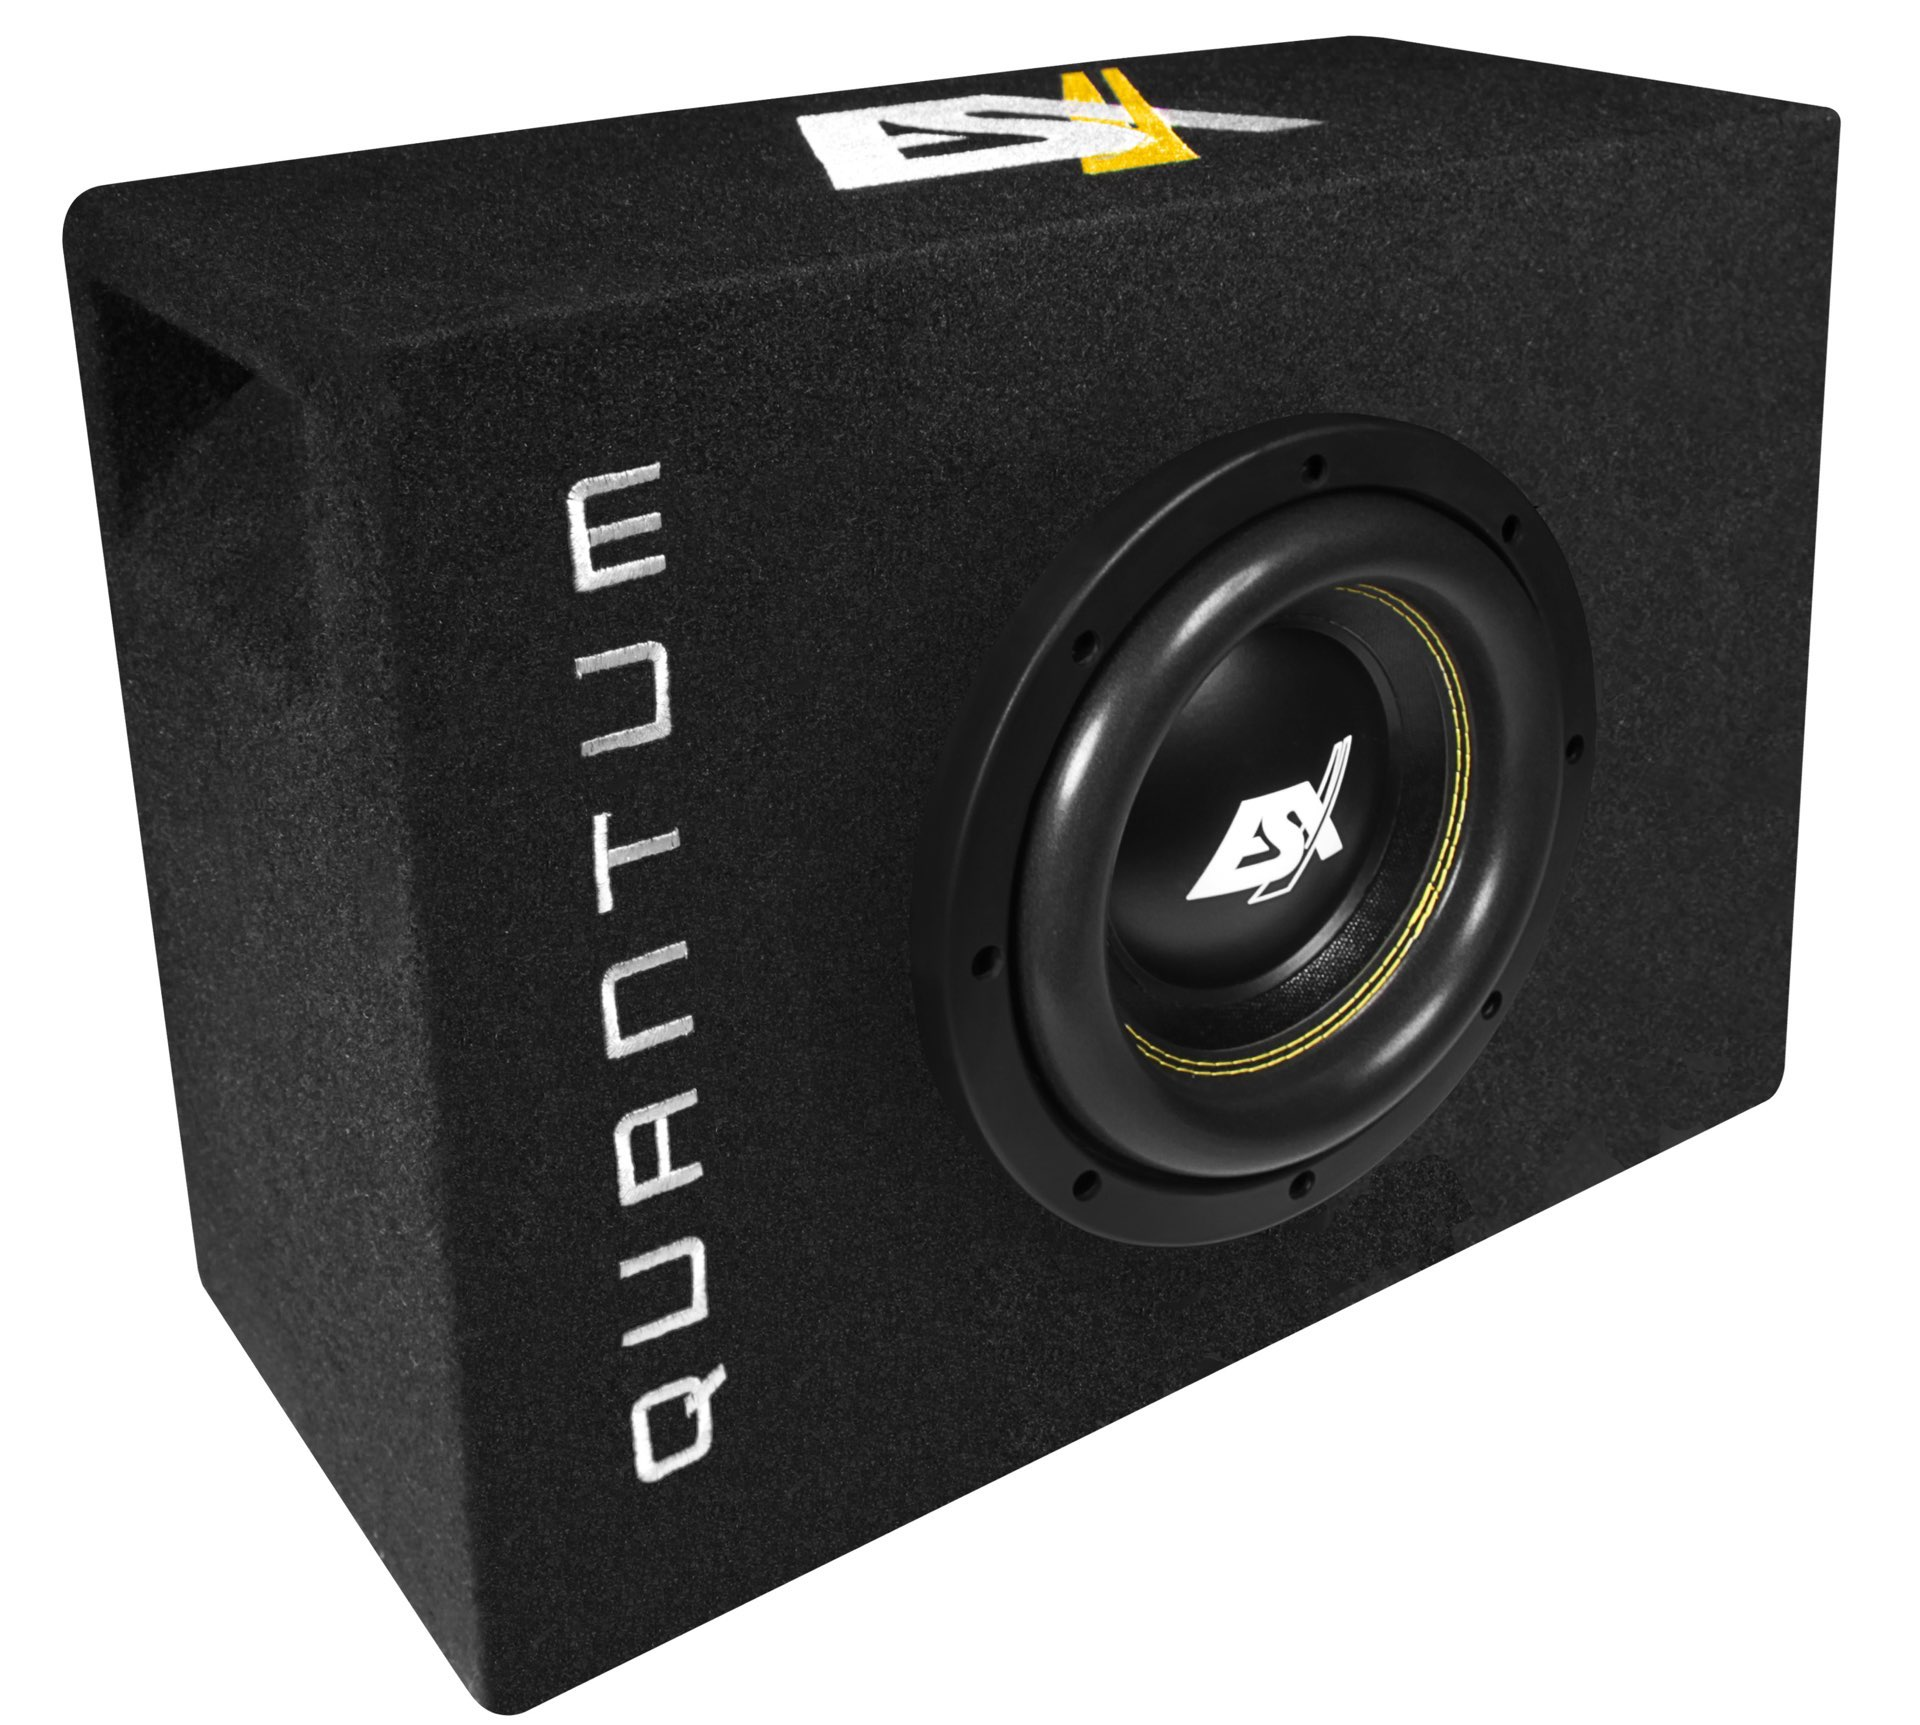 esx quantum subwoofer bass kompakt qsb8 20cm 800w. Black Bedroom Furniture Sets. Home Design Ideas